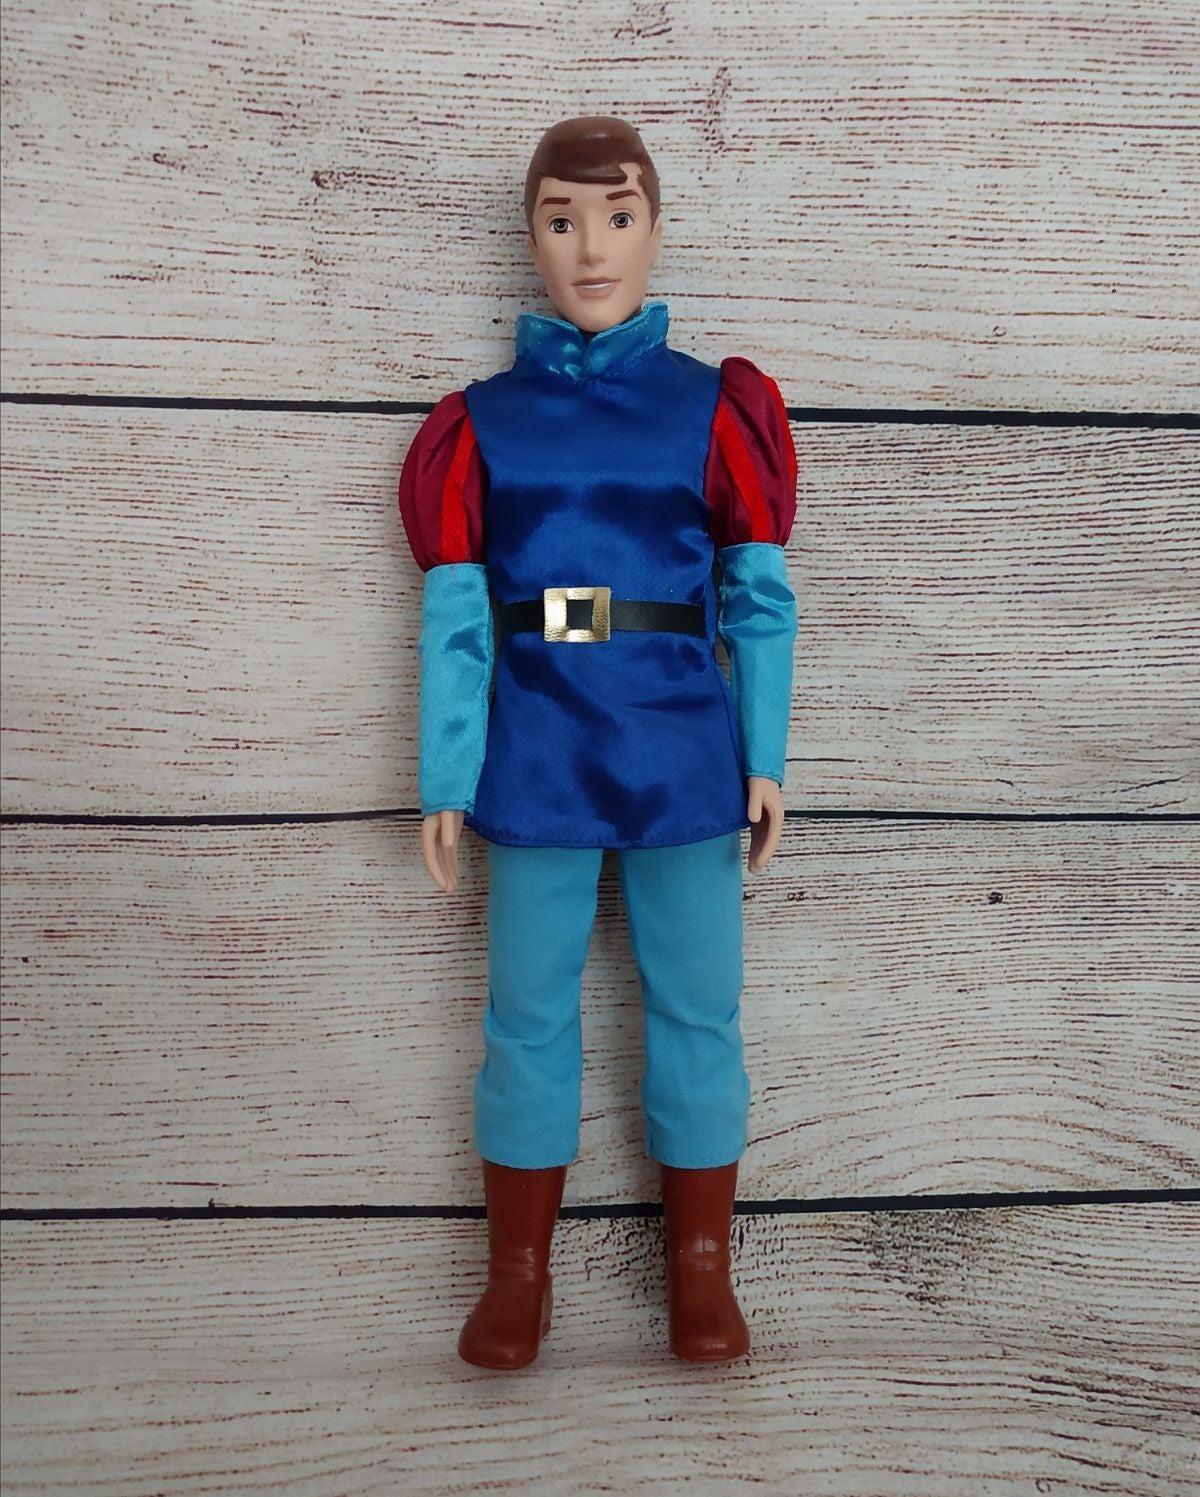 RARE Prince Philip Disney Classic Doll